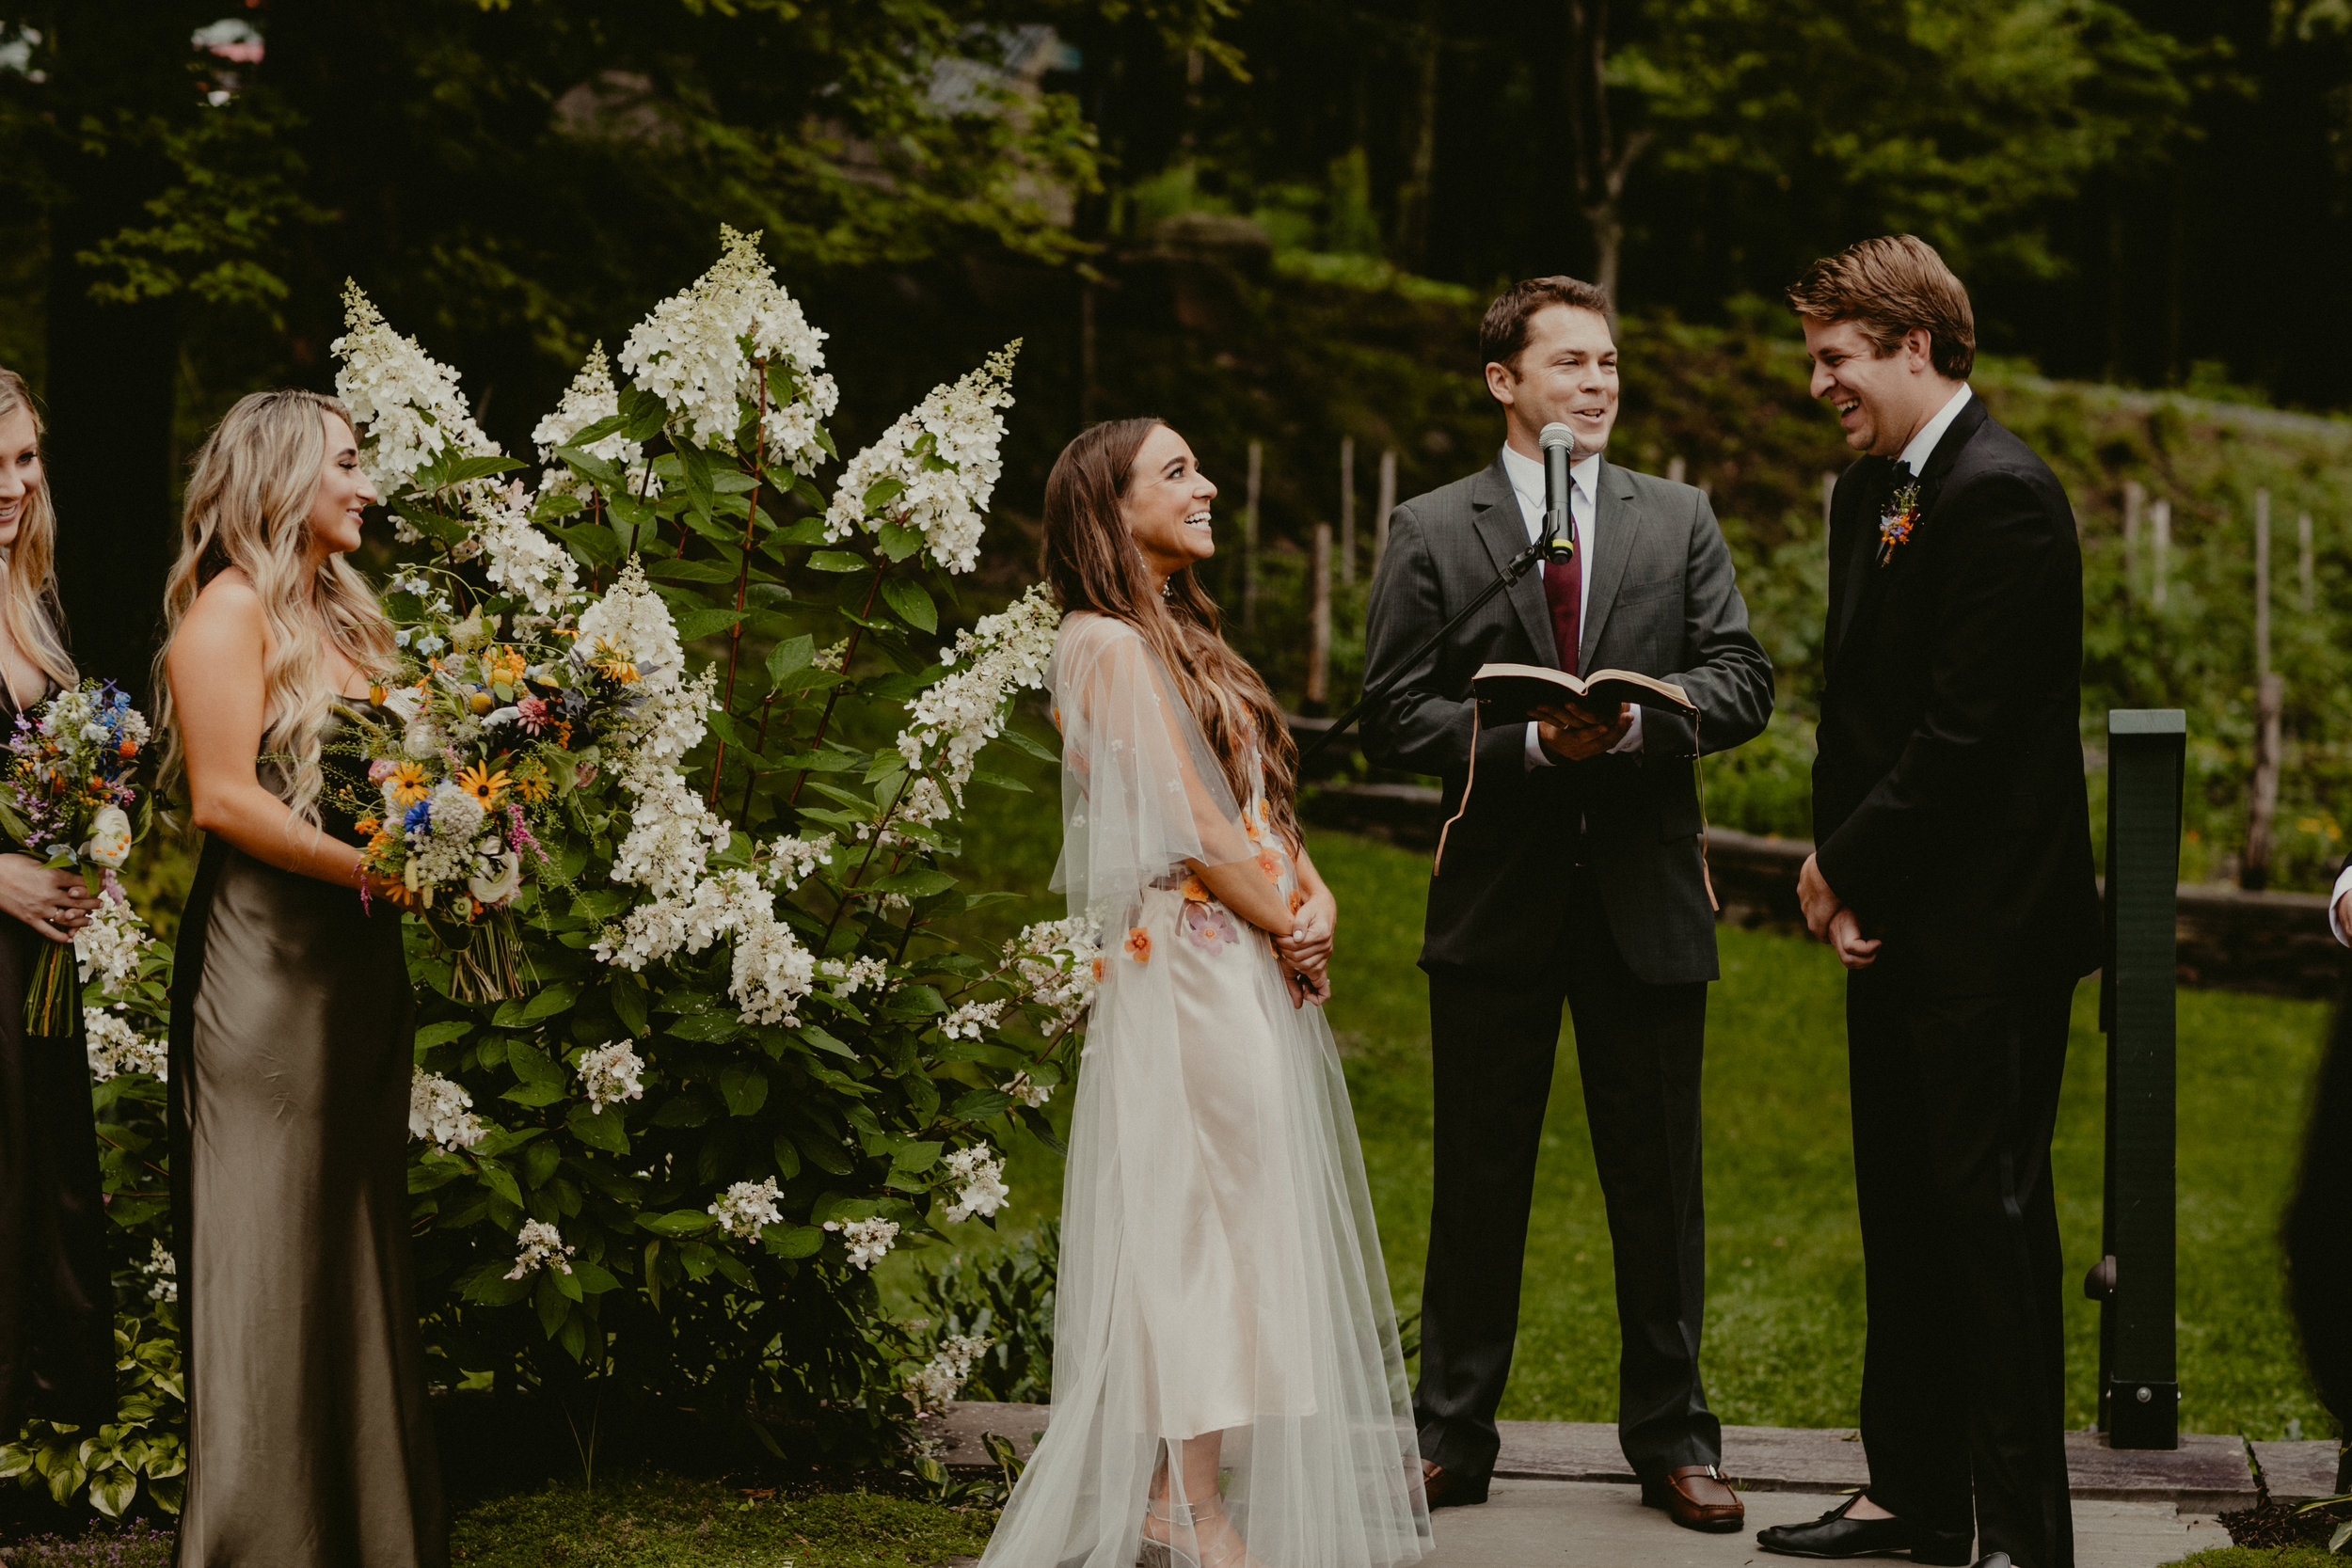 DEER_MOUNTAIN_INN_WEDDING_CHELLISE_MICHAEL_PHOTOGRAPHY-1365.jpg